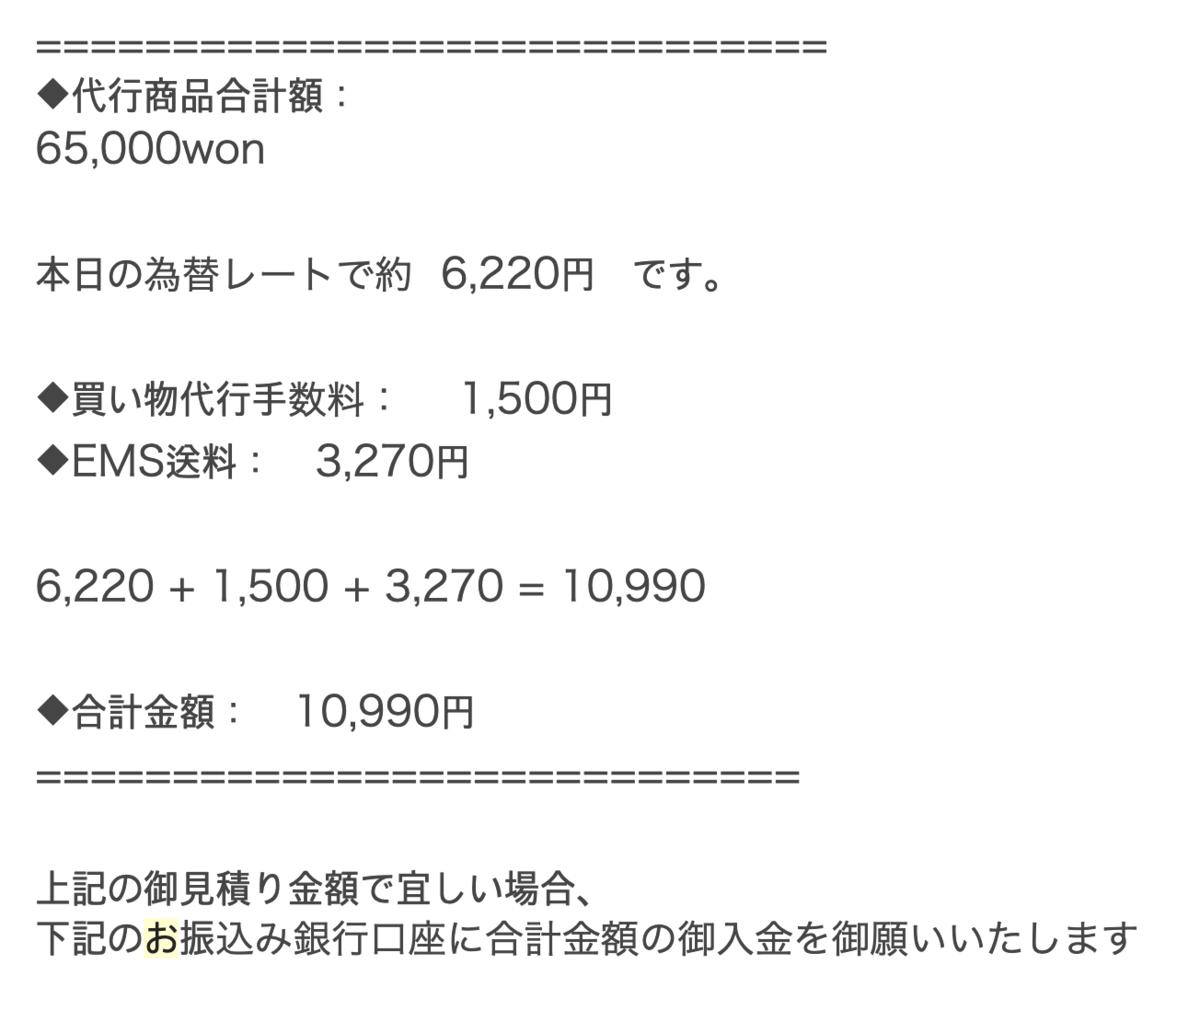 f:id:gaogaox:20200824223156p:plain